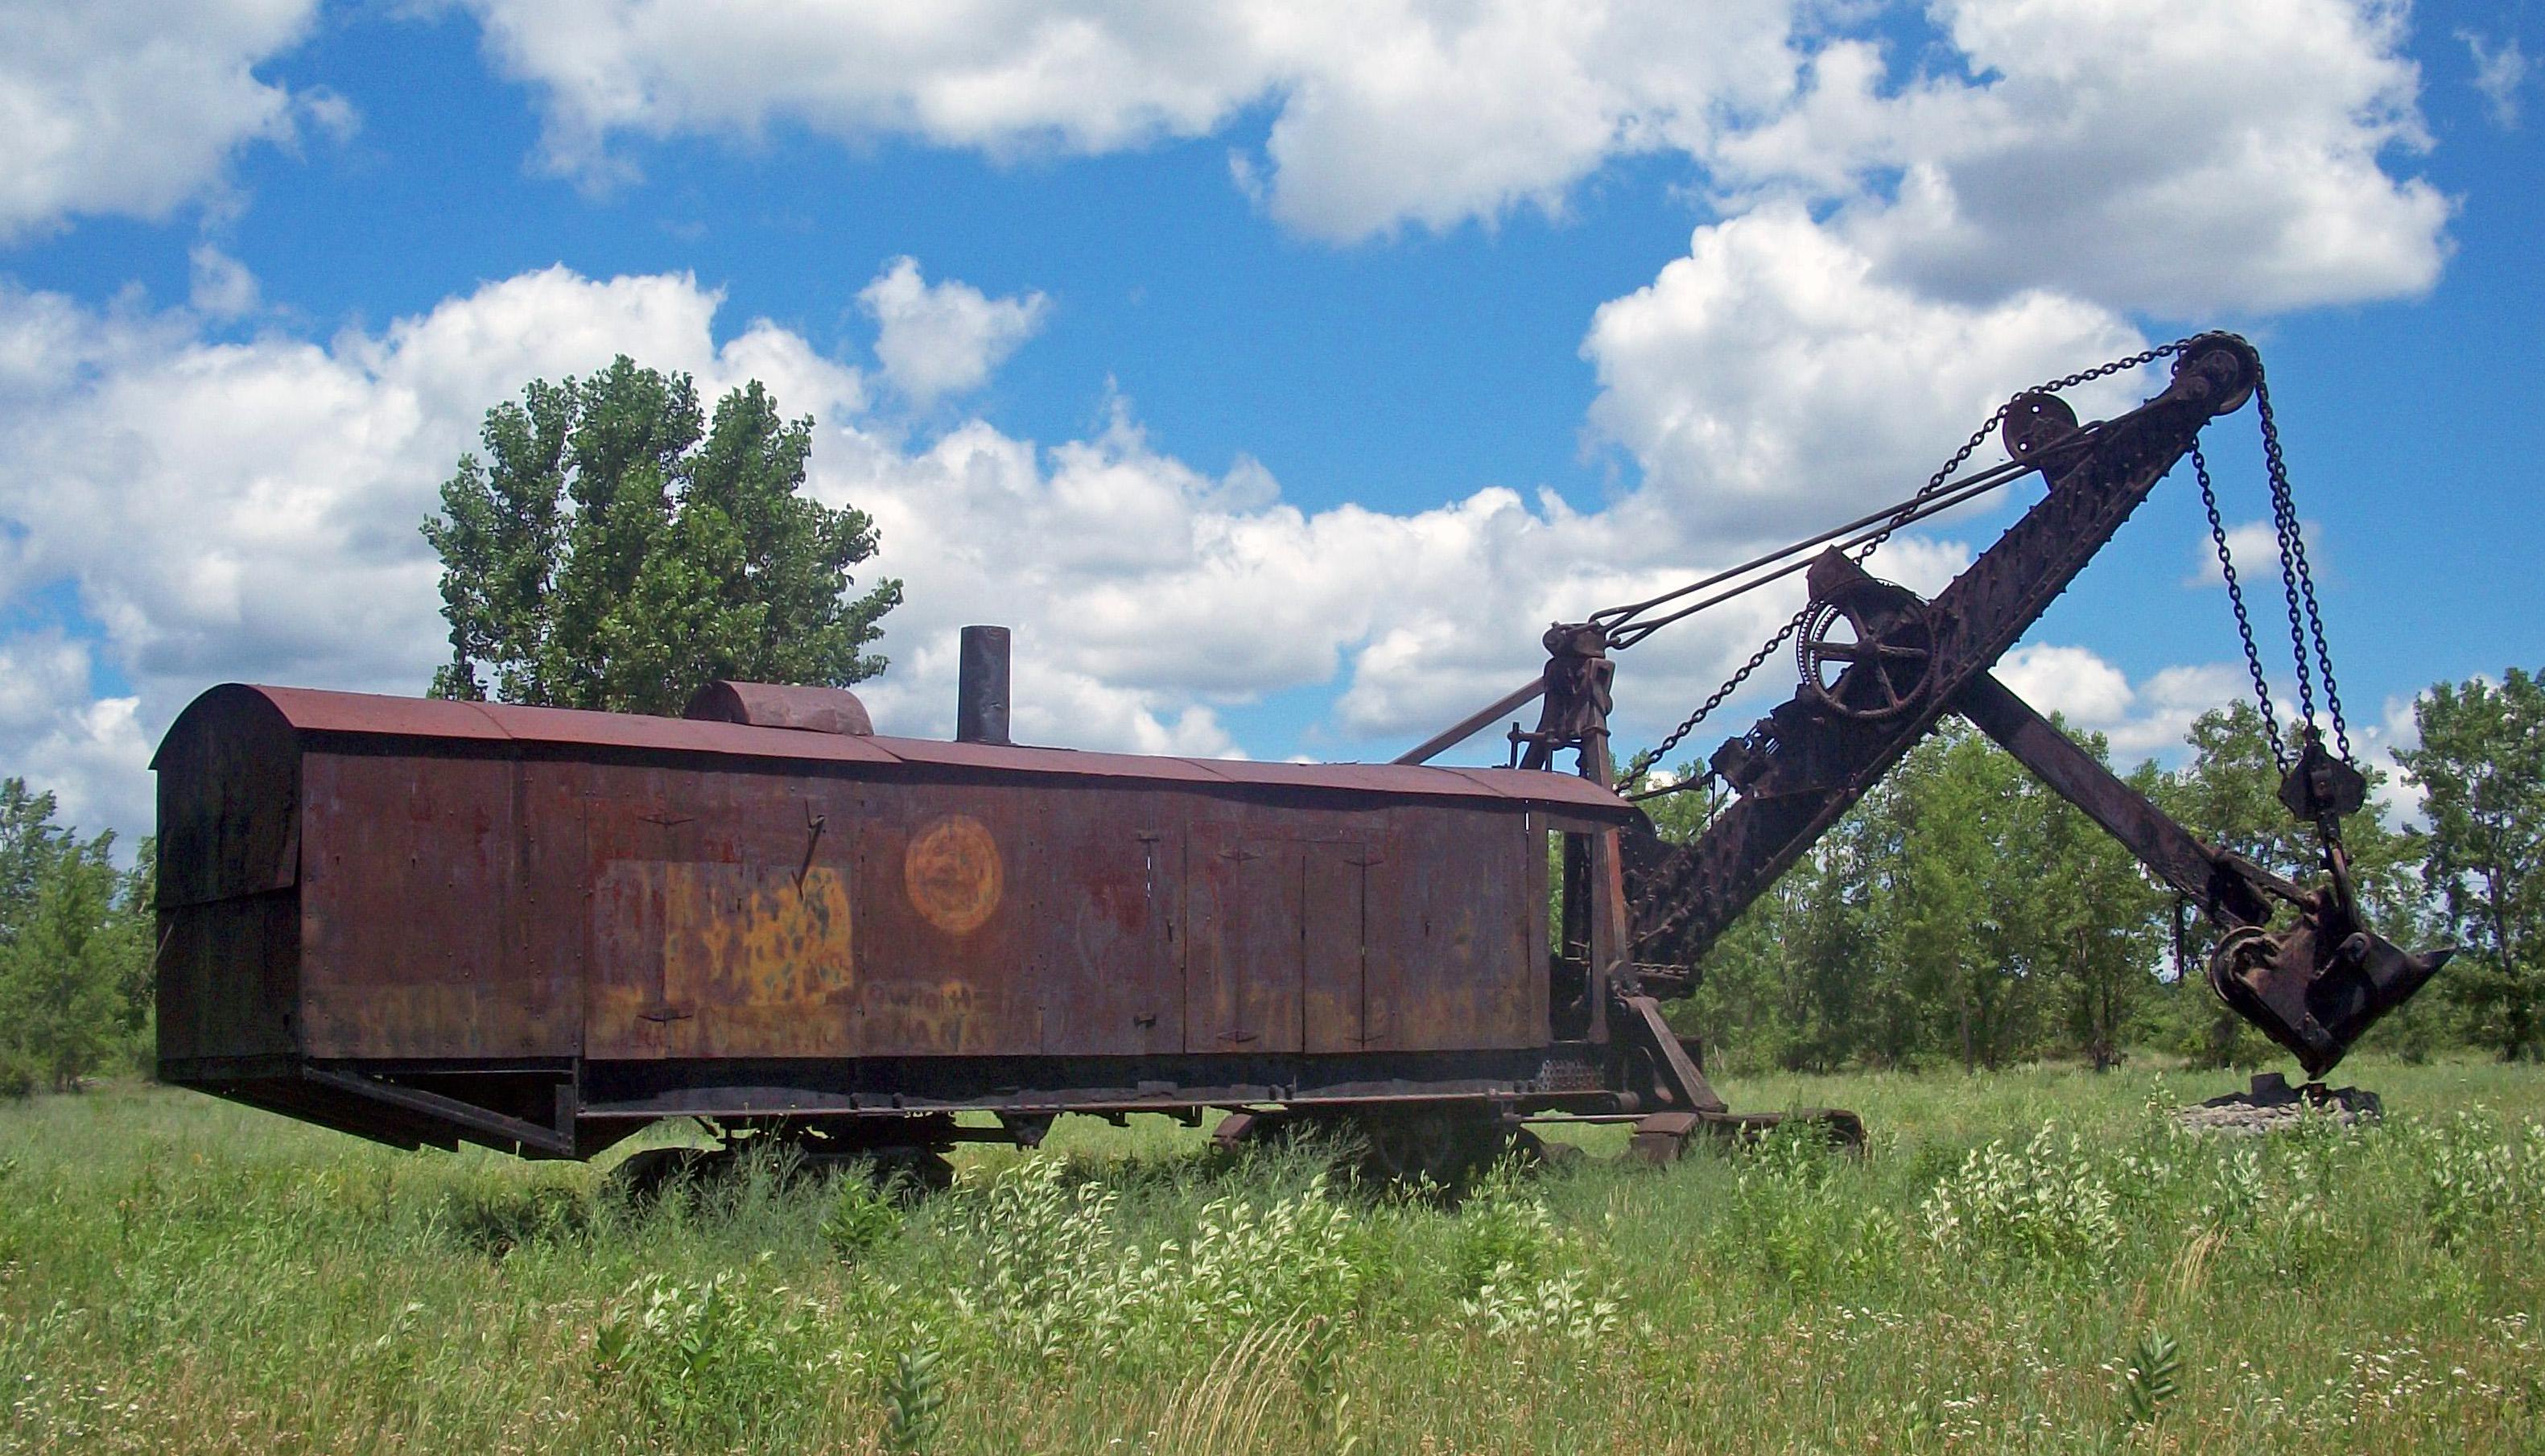 File:Marion Steam Shovel, Le Roy, NY.jpg - Wikipedia